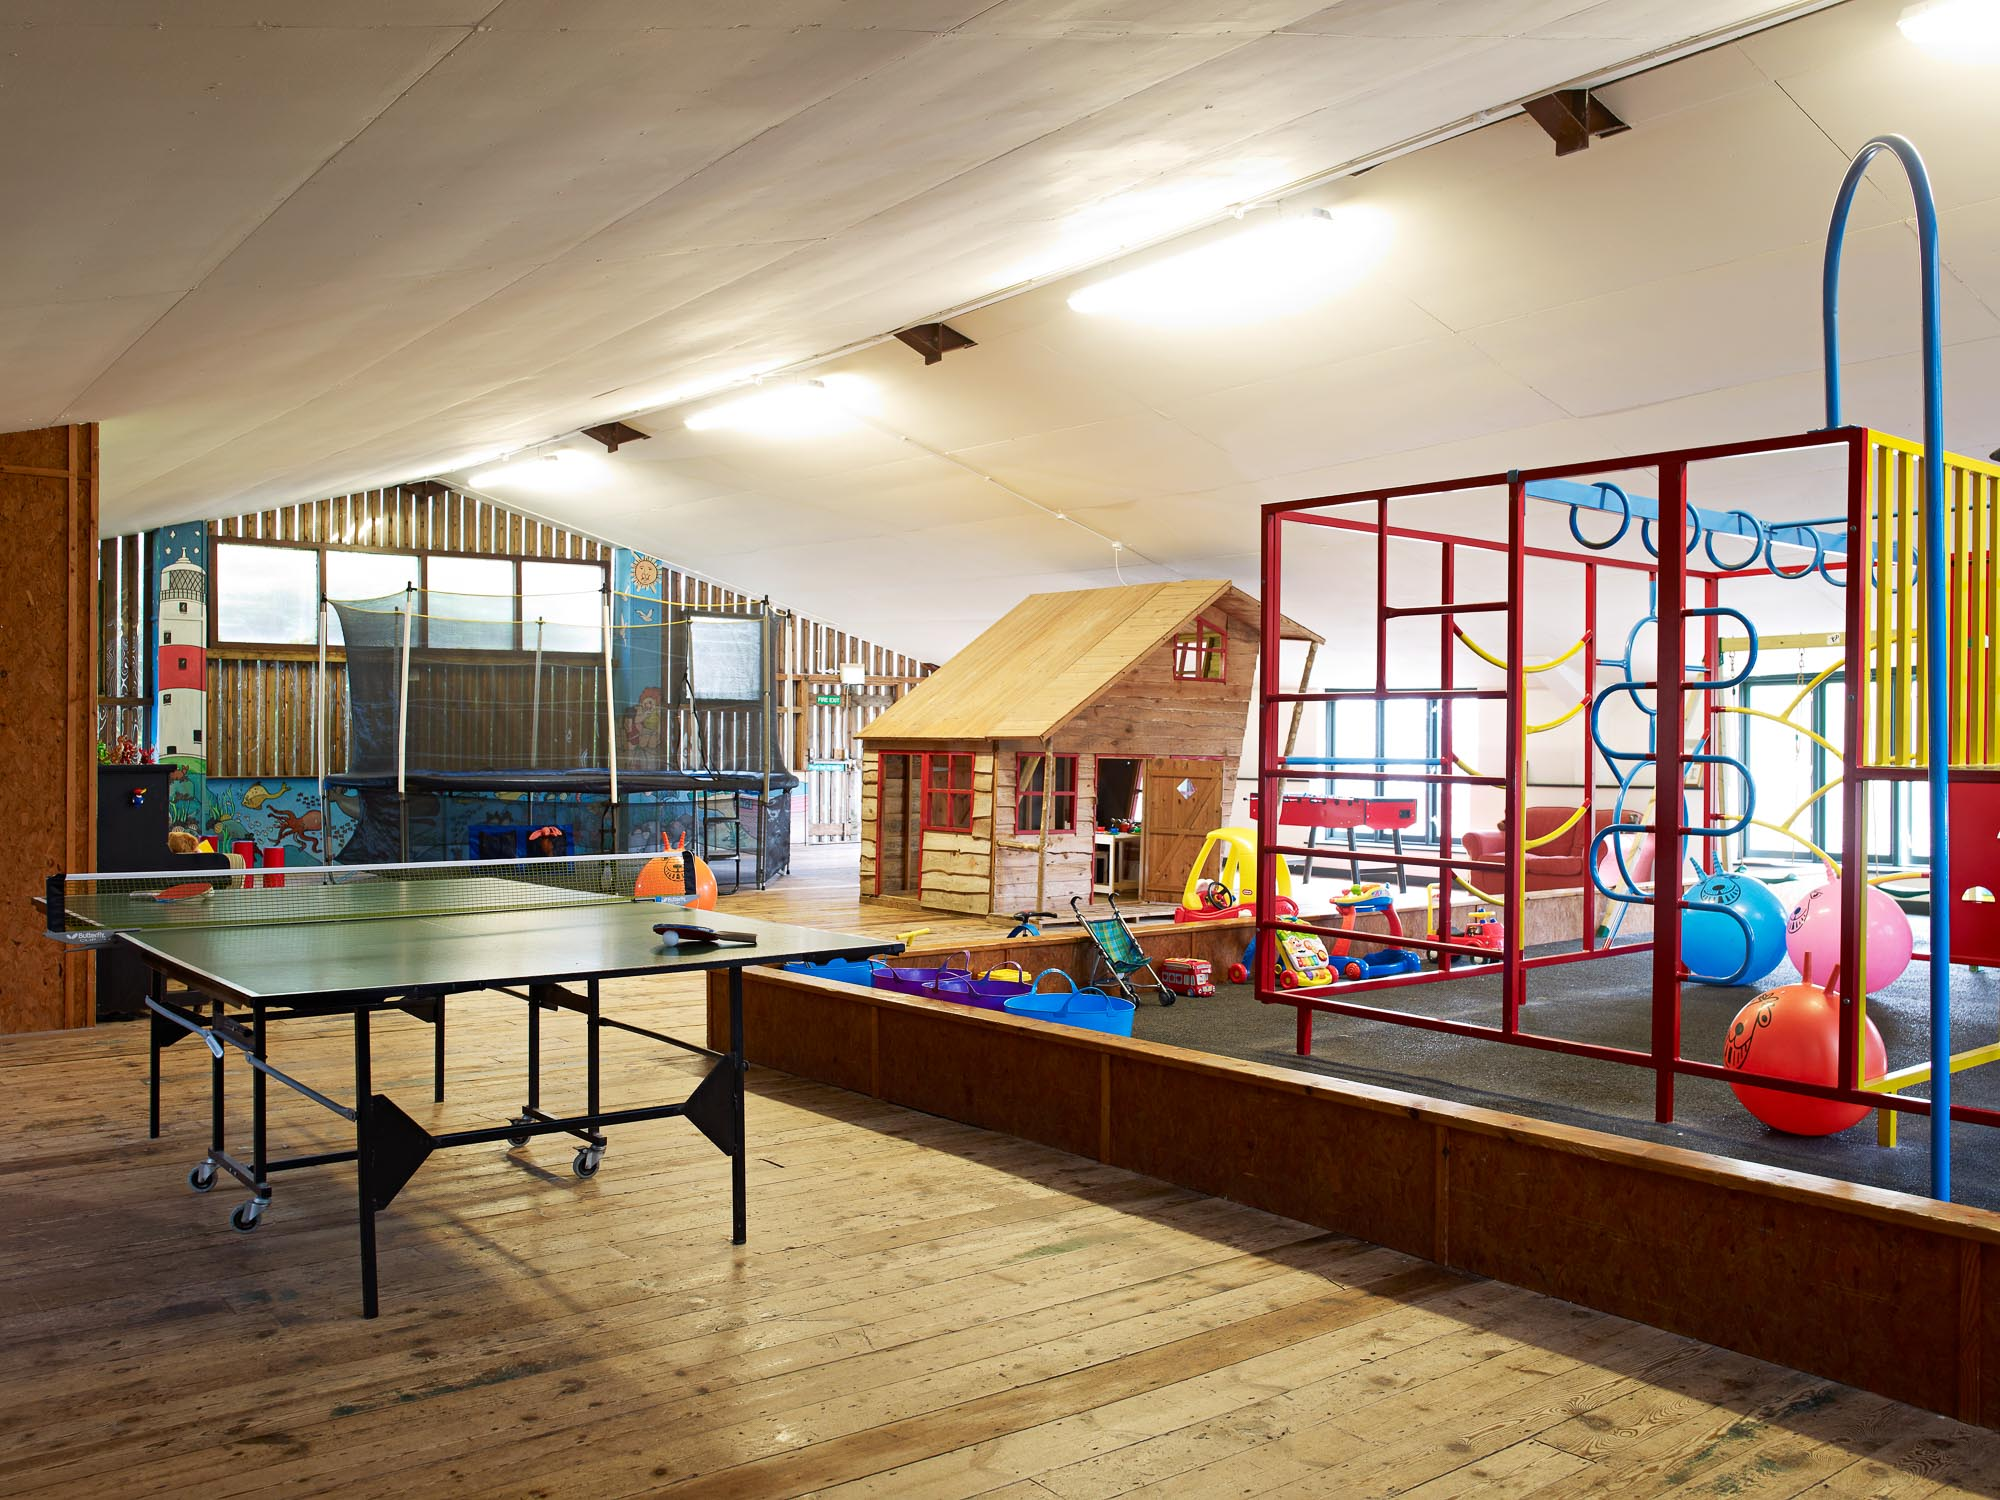 FF Pool & Barn 45246.jpg